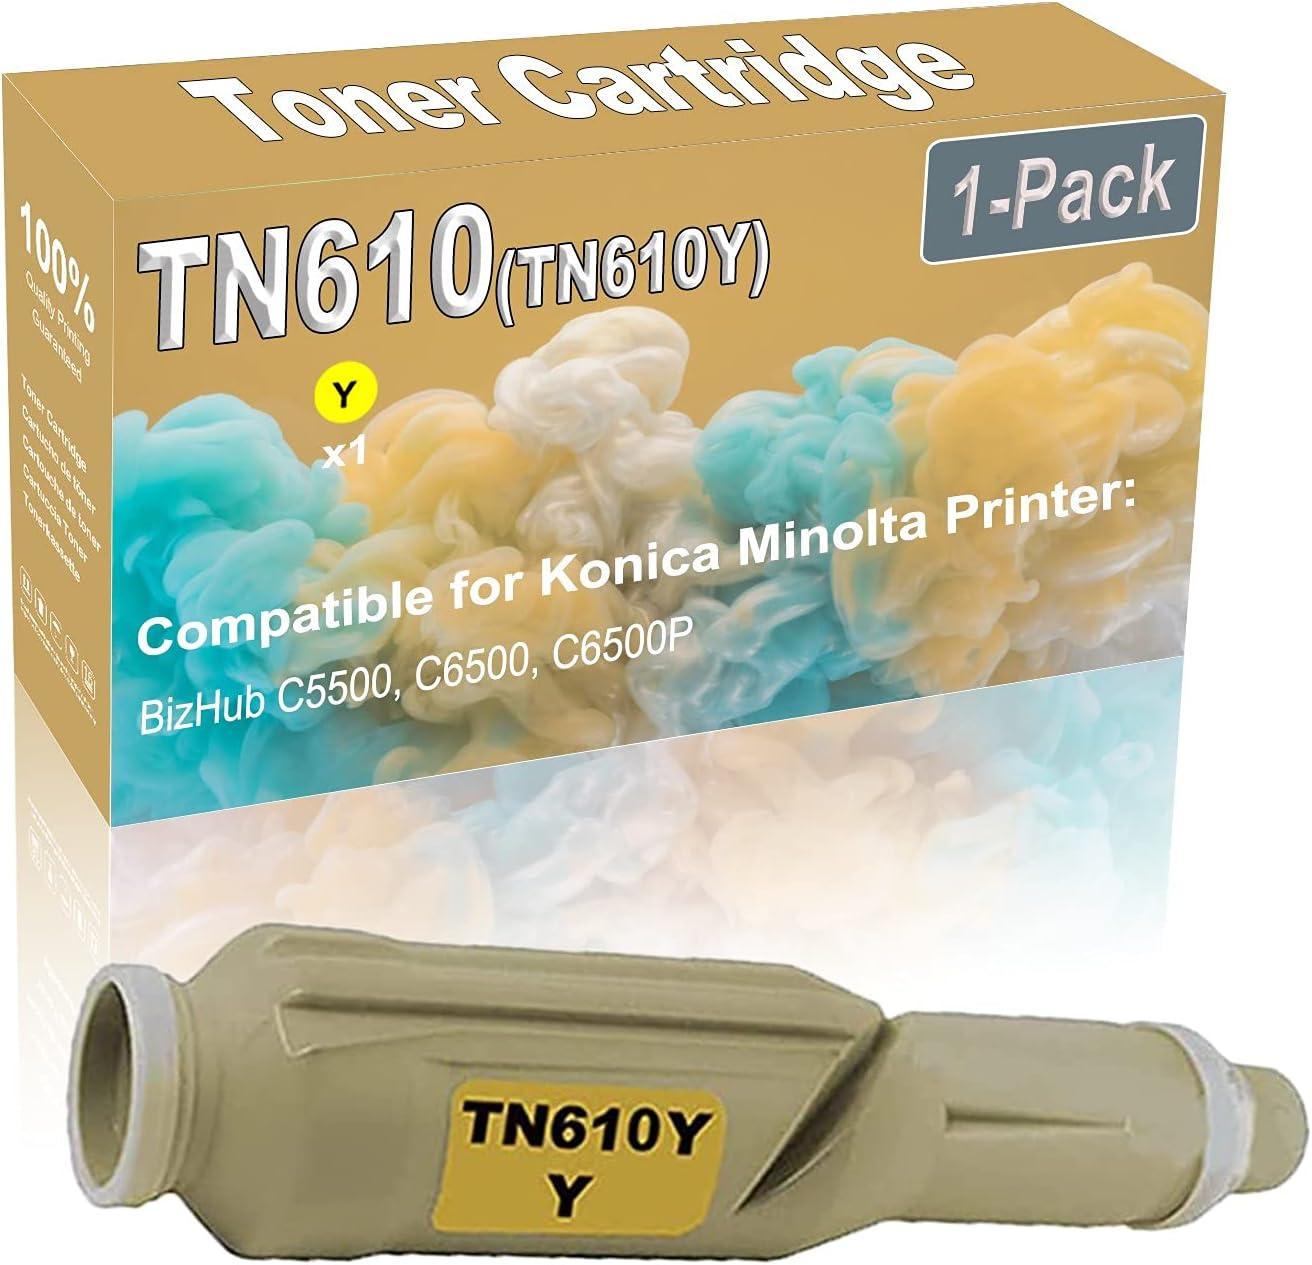 1-Pack (Yellow) Compatible BizHub C5500 C6500 Laser Printer Toner Cartridge (High Capacity) Replacement for Konica Minolta TN610 (TN610Y) Printer Toner Cartridge